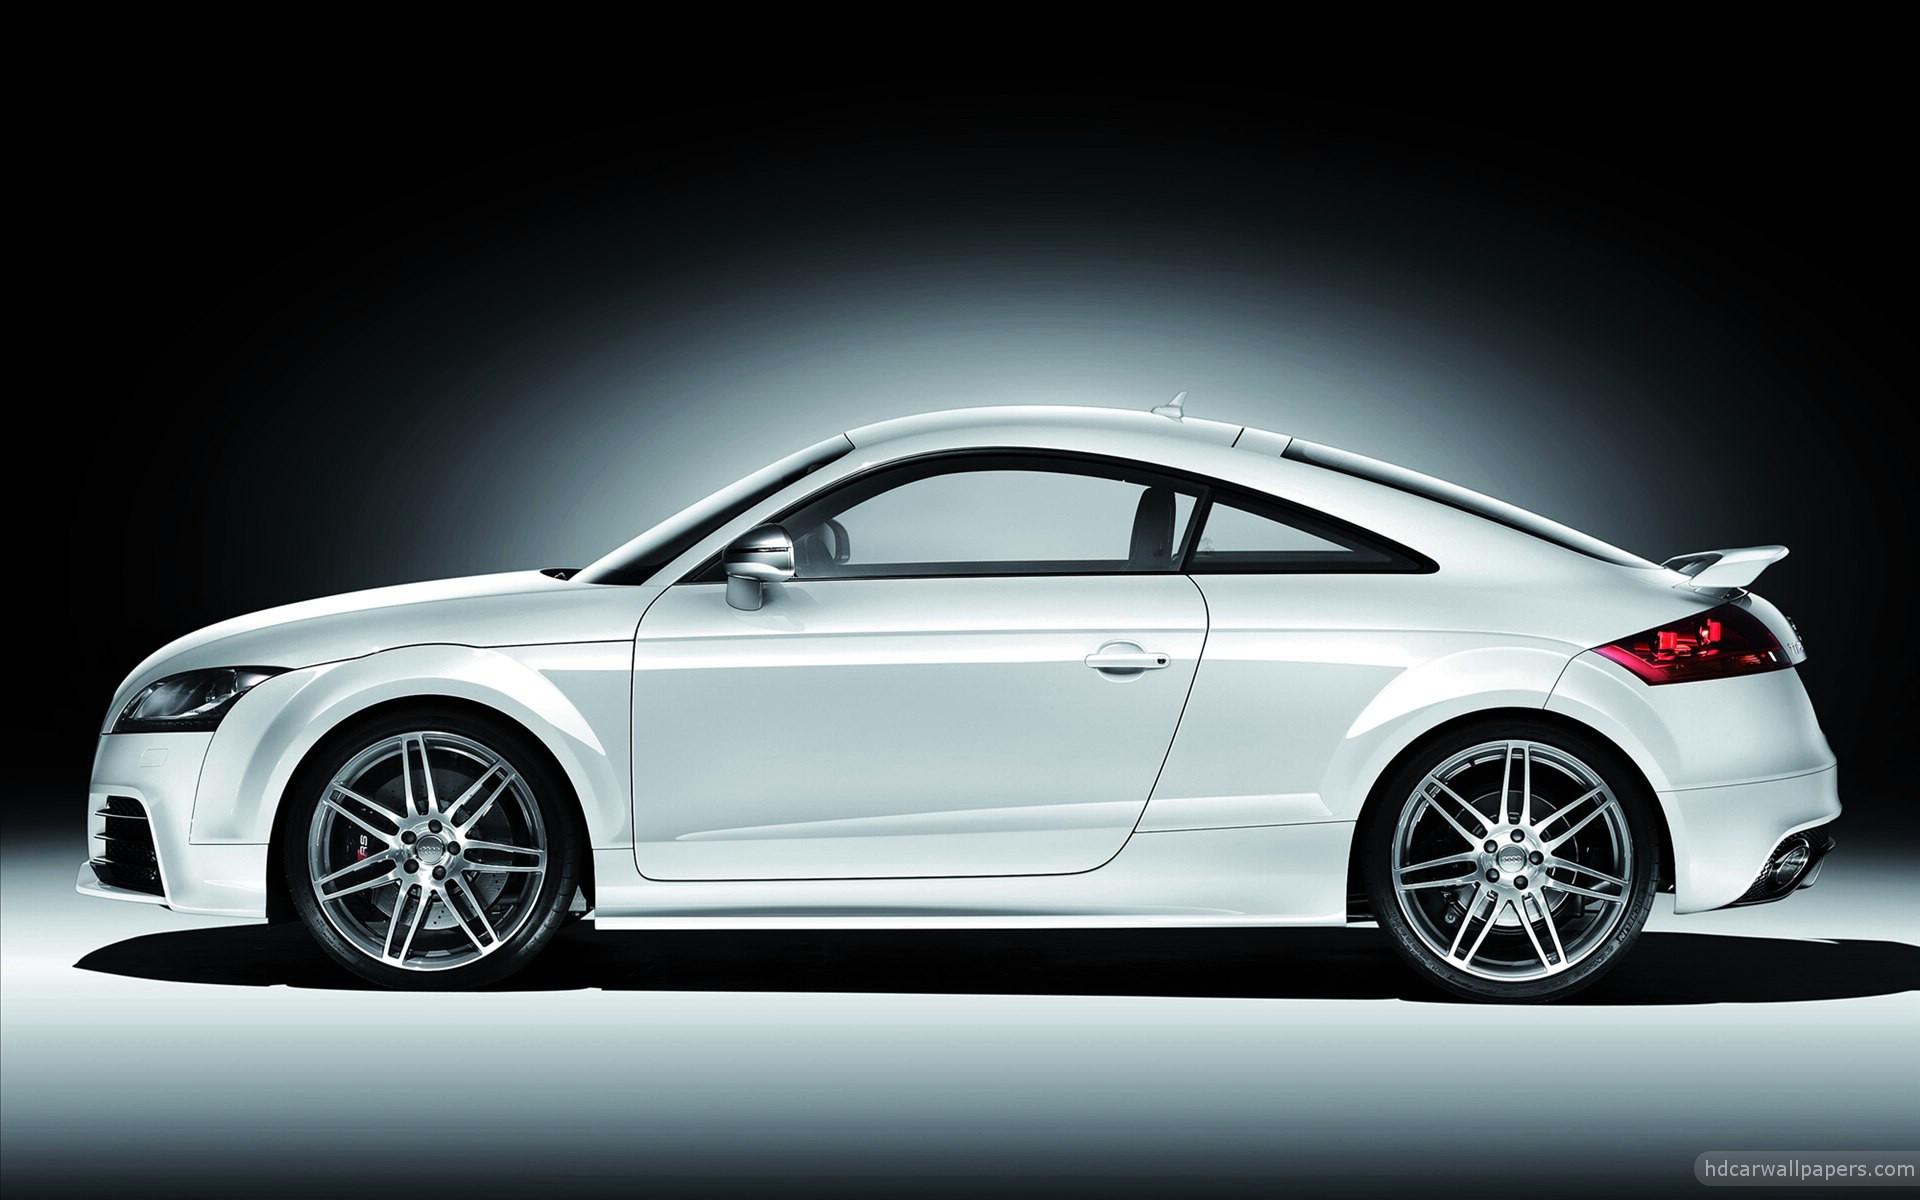 2012 Audi TT RS 3 Wallpaper HD Car Wallpapers 1920x1200